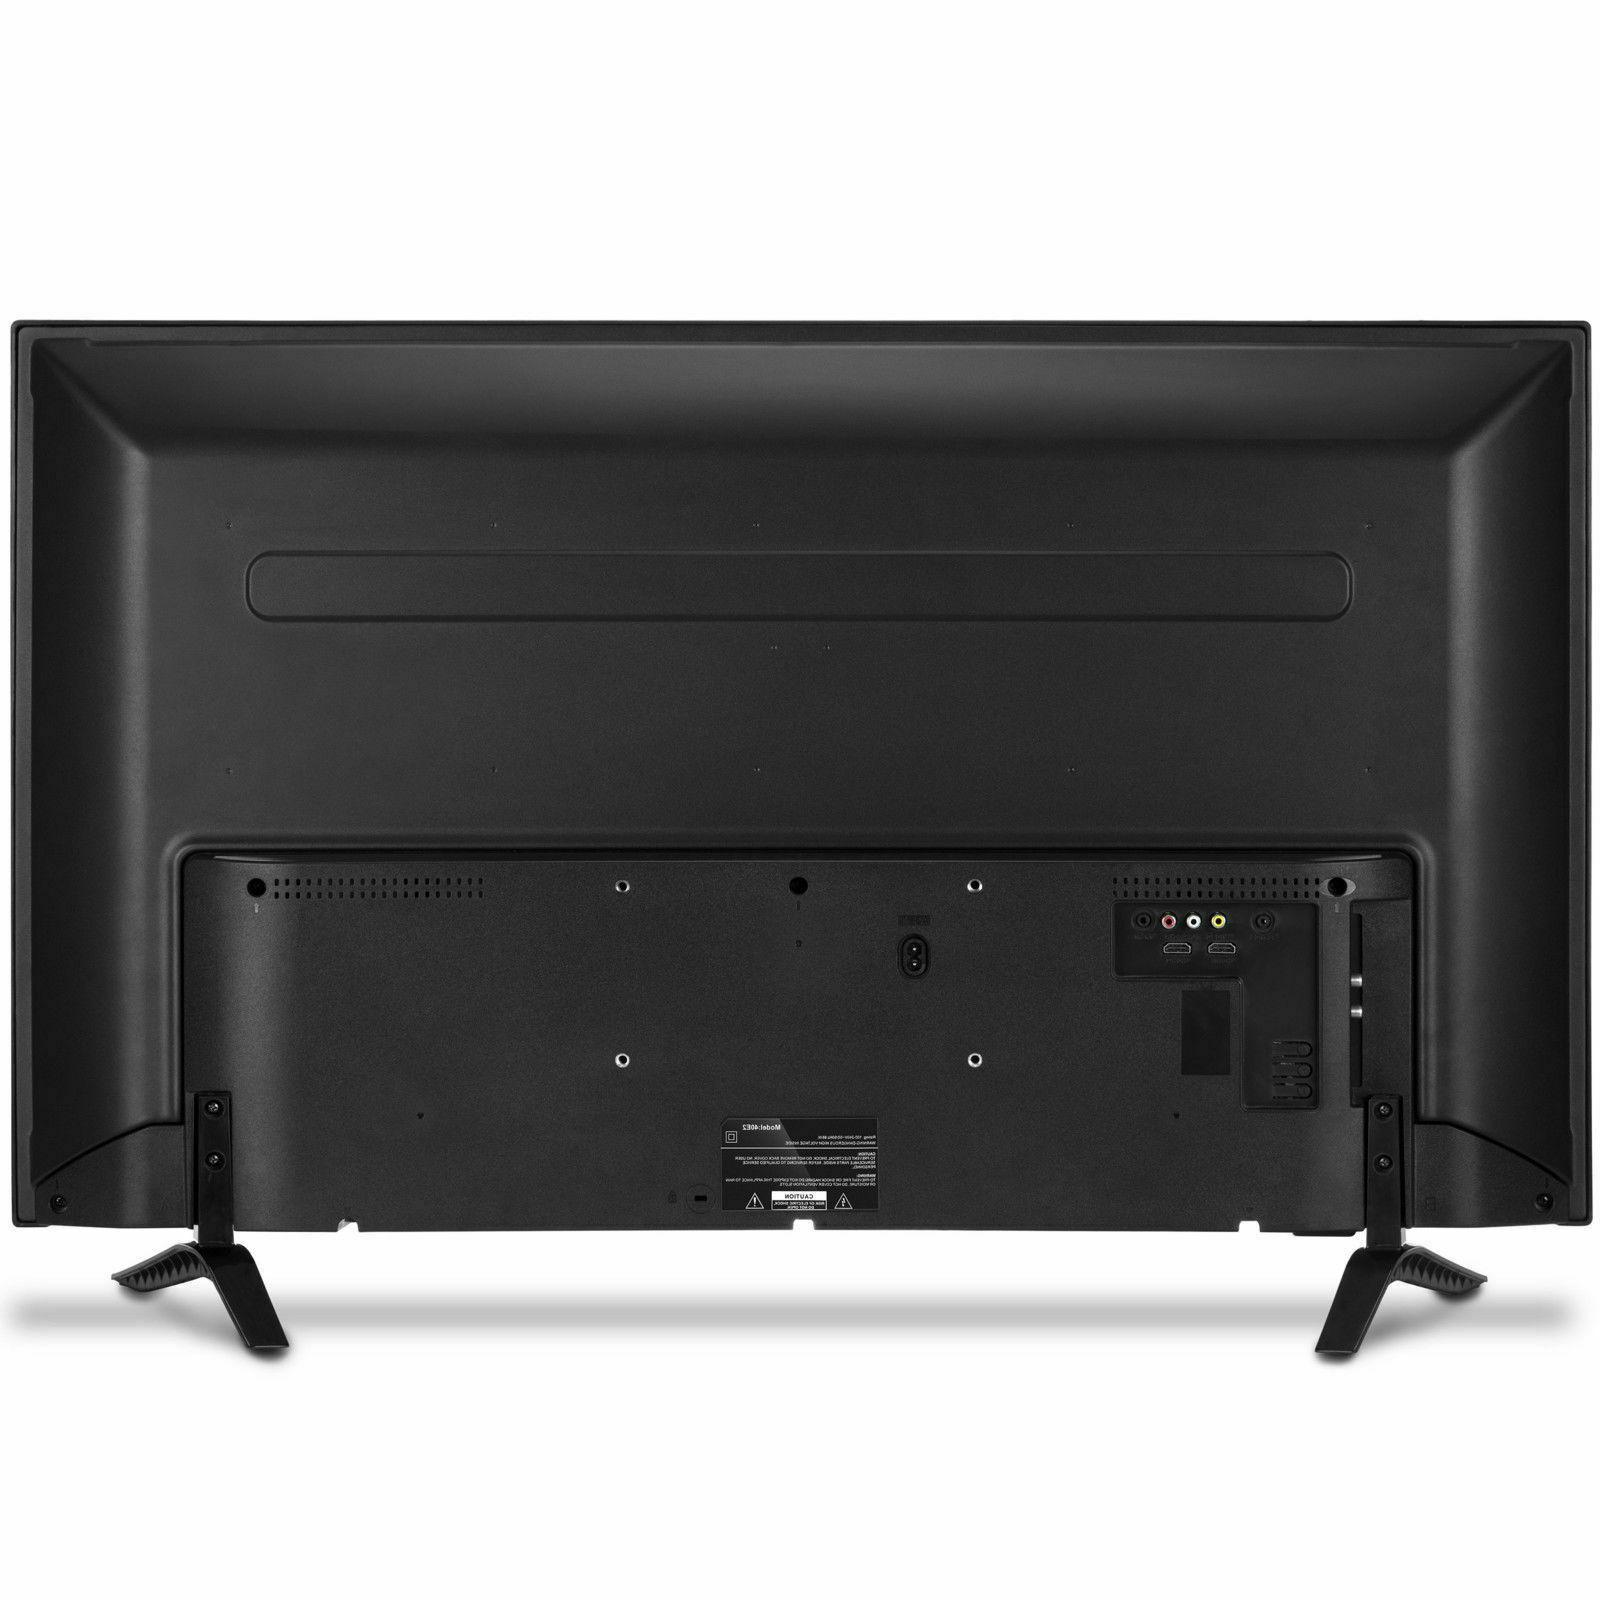 "Skyworth 40"" FHD LED TV freestanding"